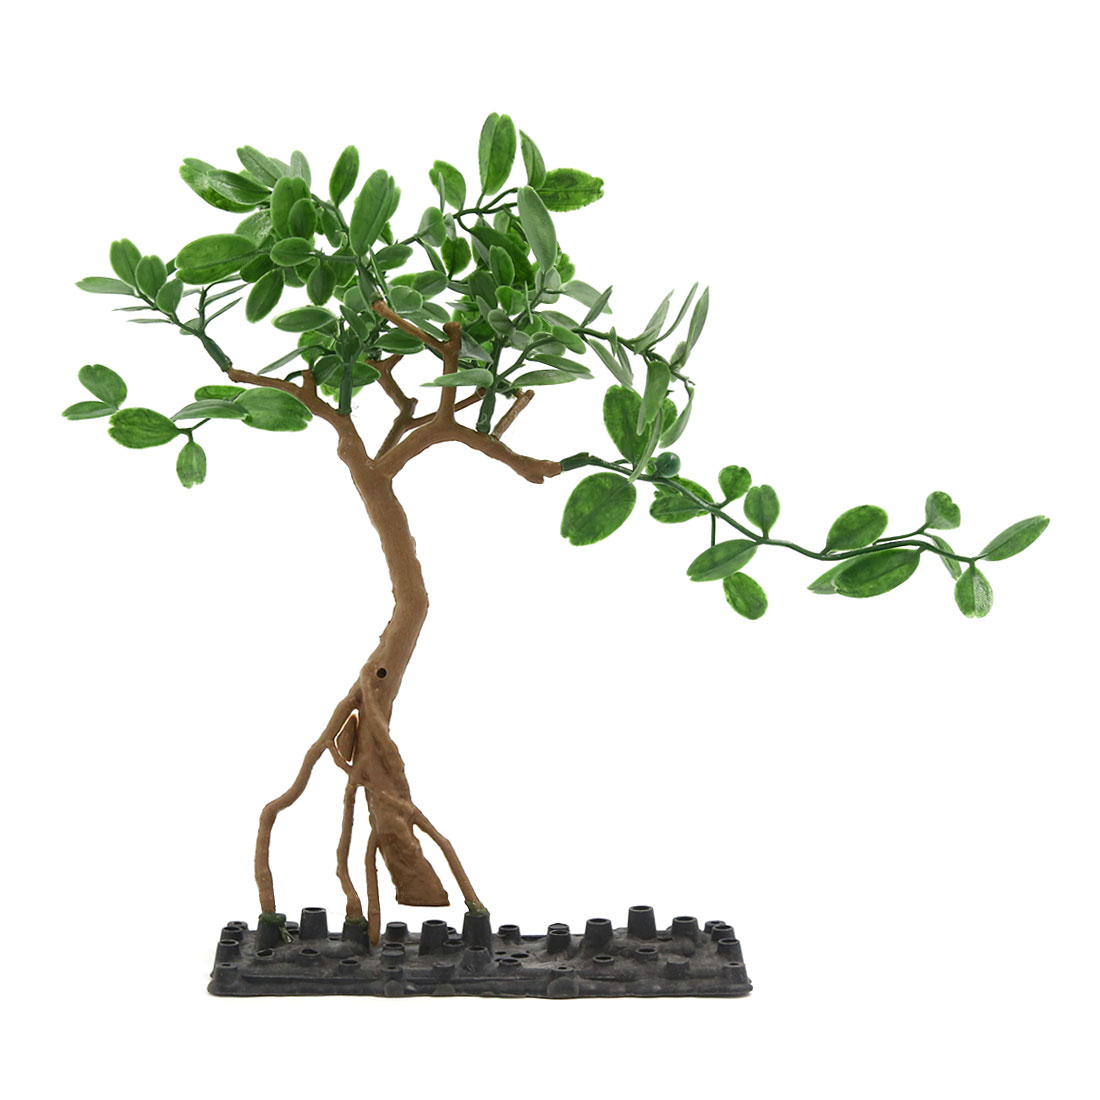 Fish Tank Green Tree Decor Ornament With Plastic Base 16x6x26cm